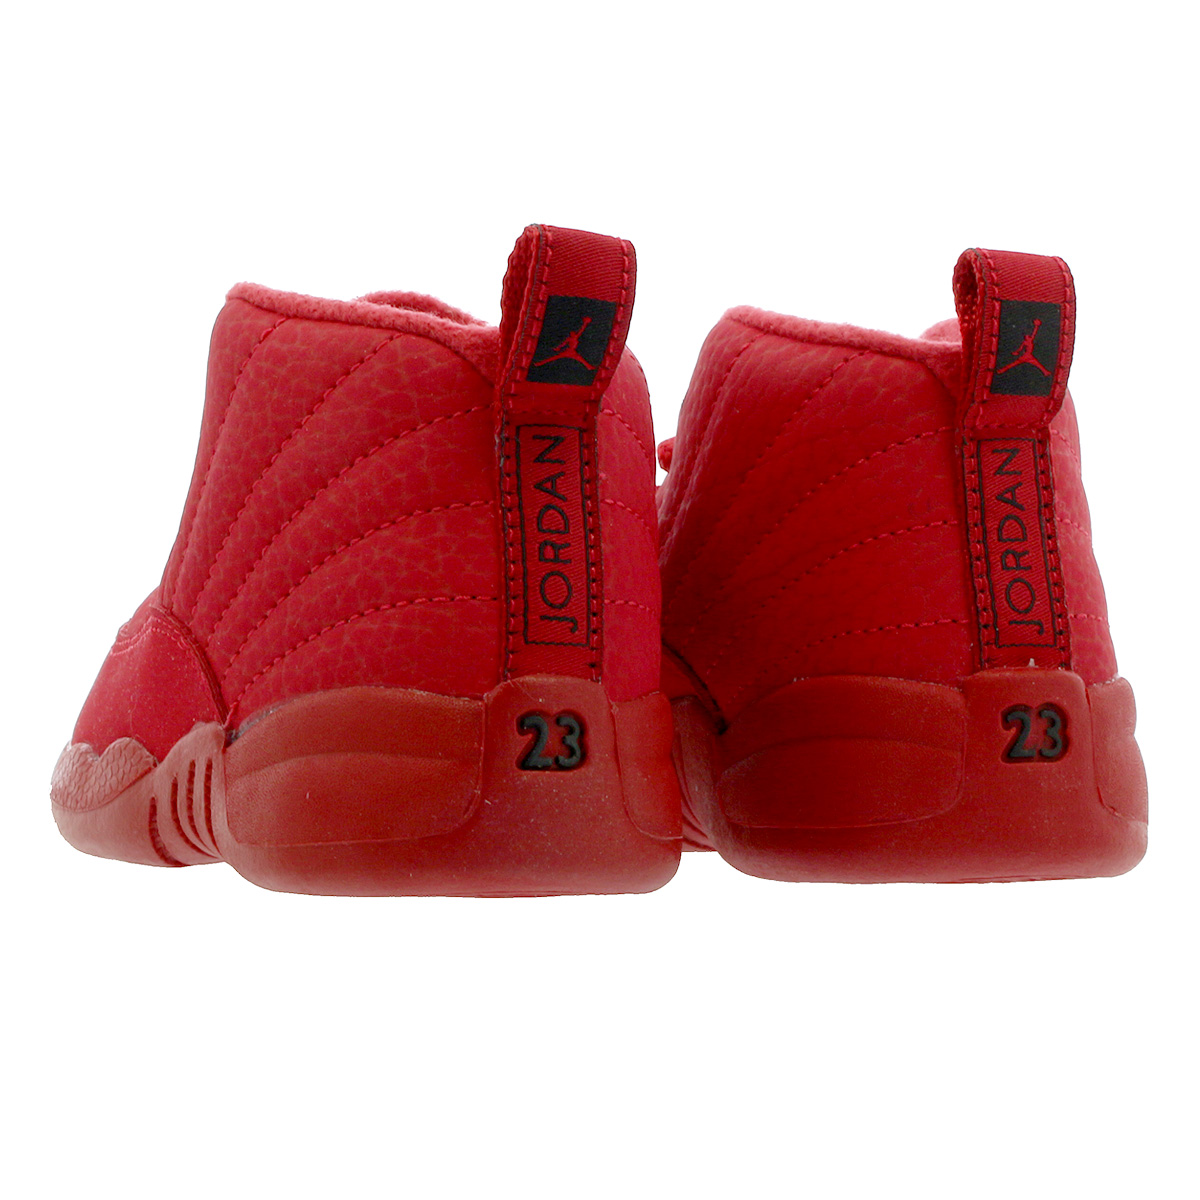 huge discount dd6a9 c20b8 NIKE AIR JORDAN 12 RETRO TD Nike Air Jordan 12 nostalgic TD GYM  RED/BLACK/BLACK 850,000-601